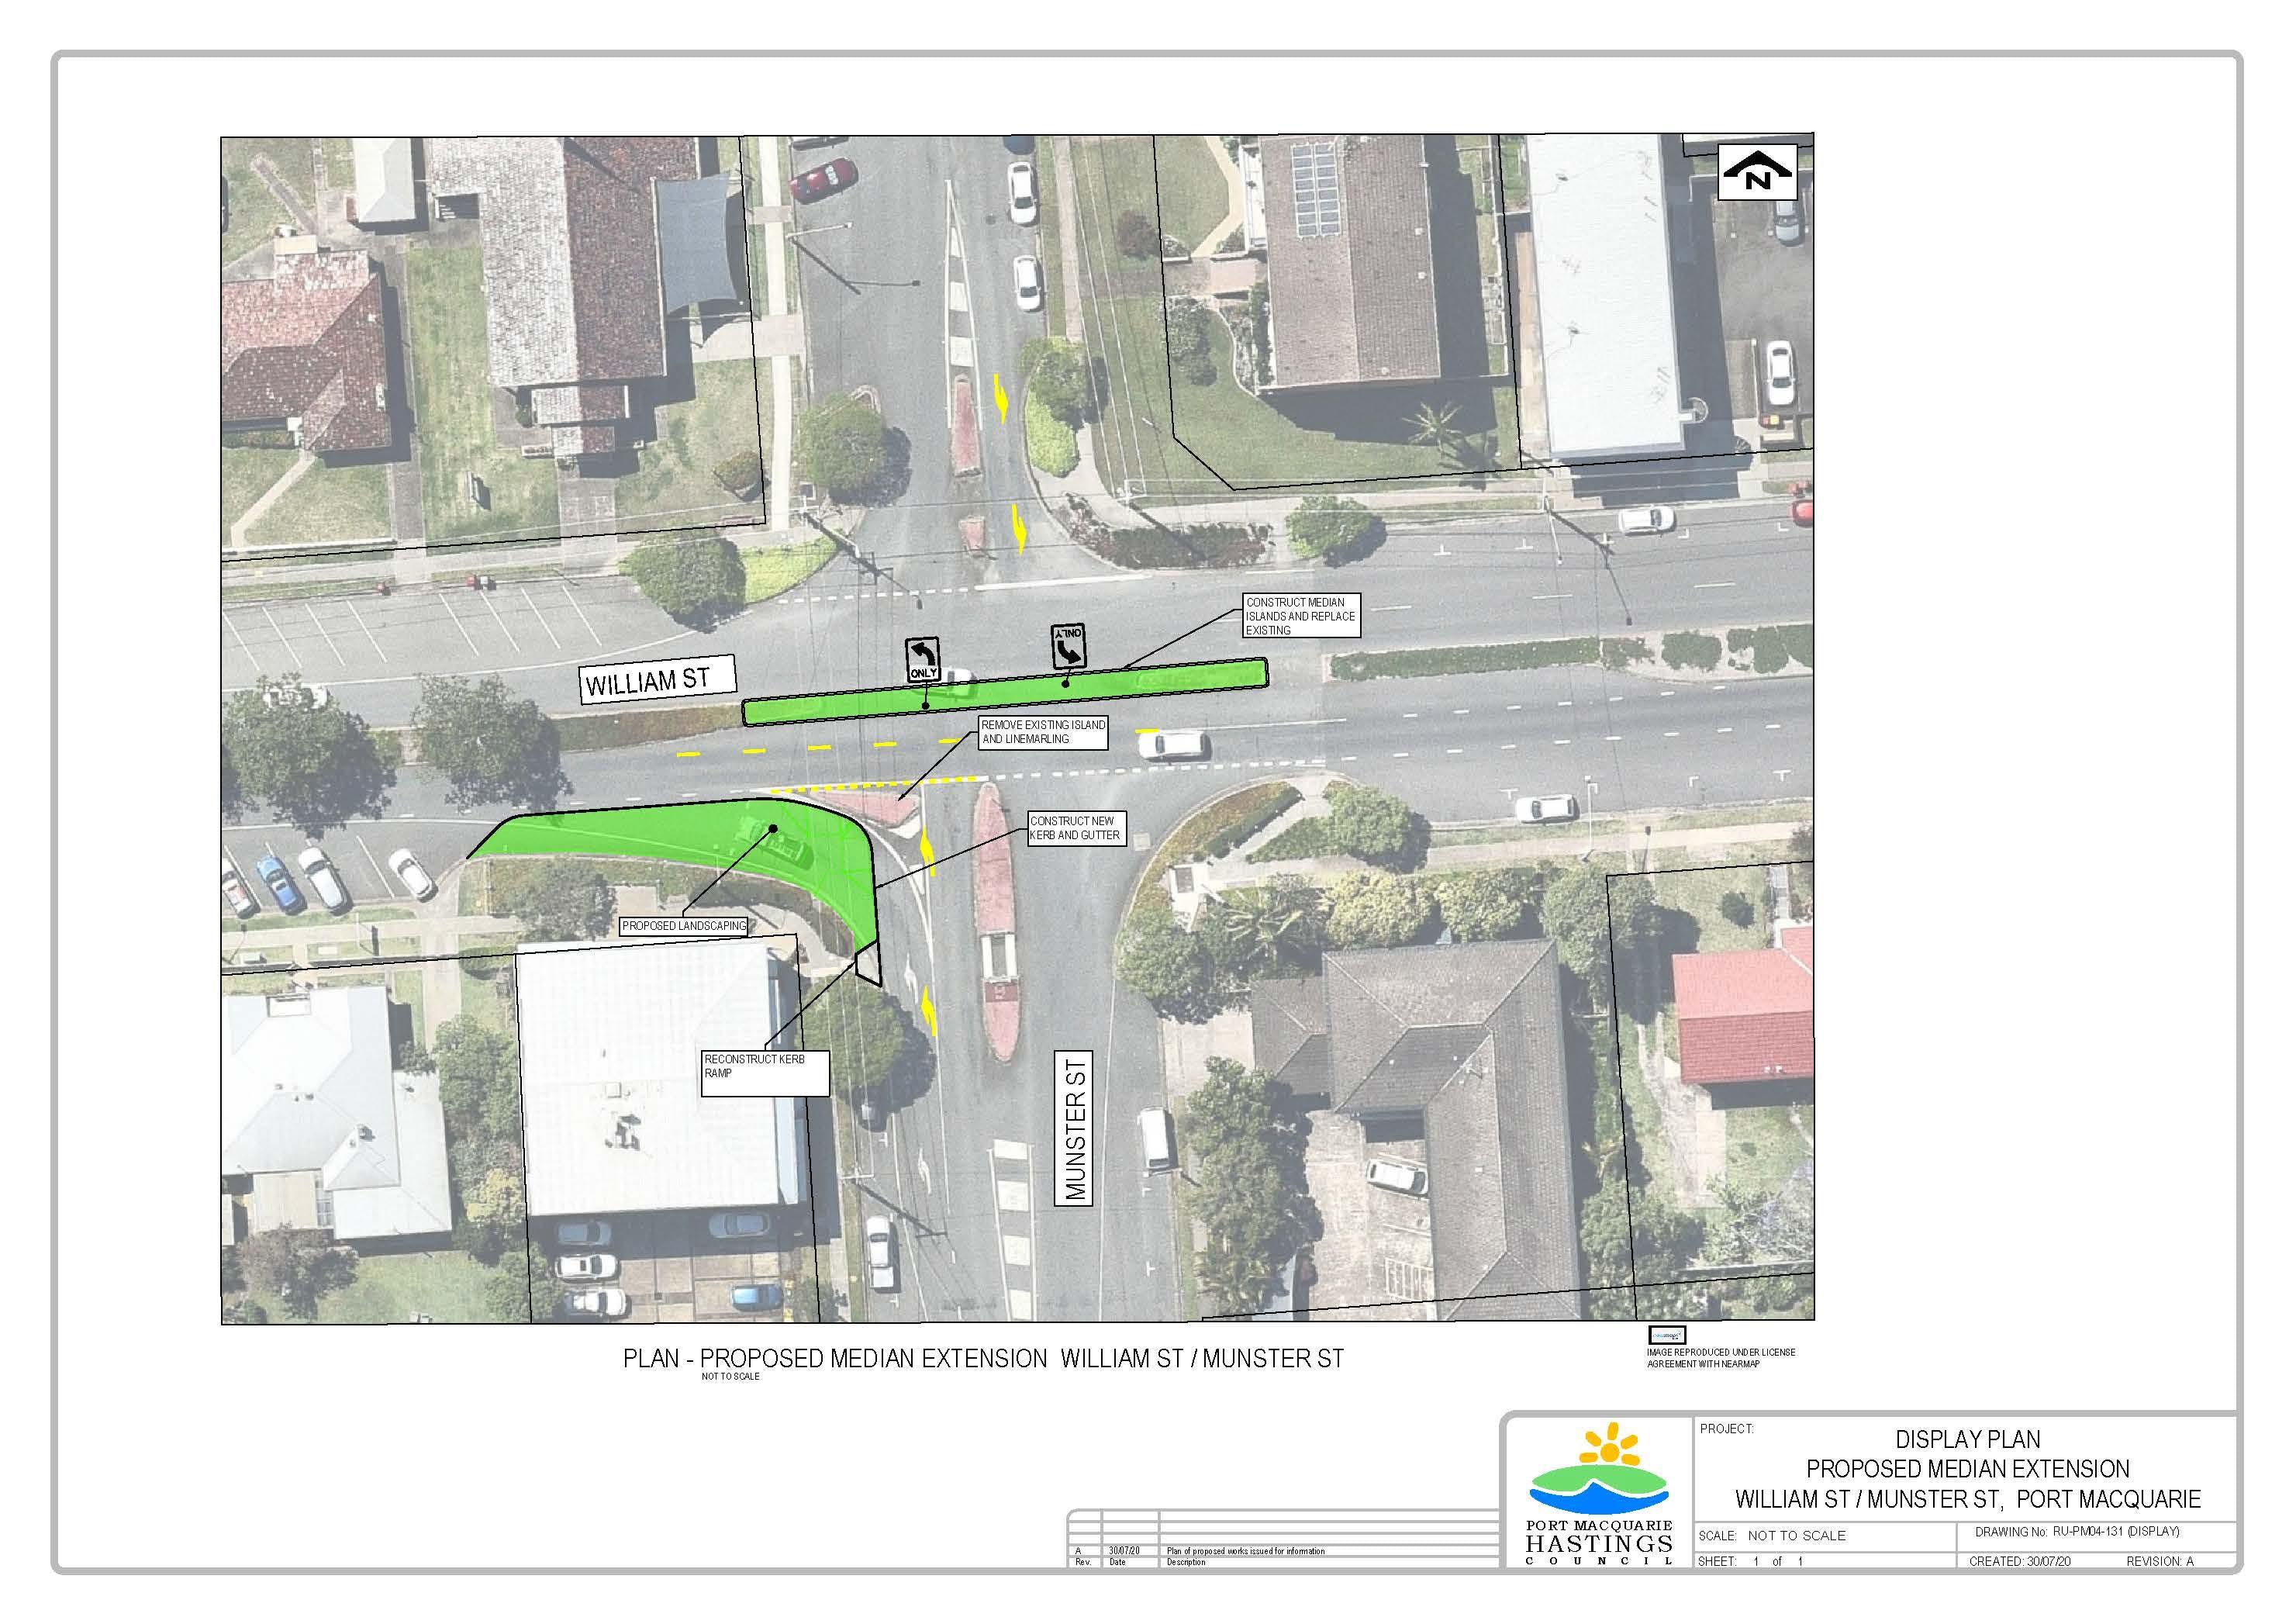 William St and Munster St central median  display plan